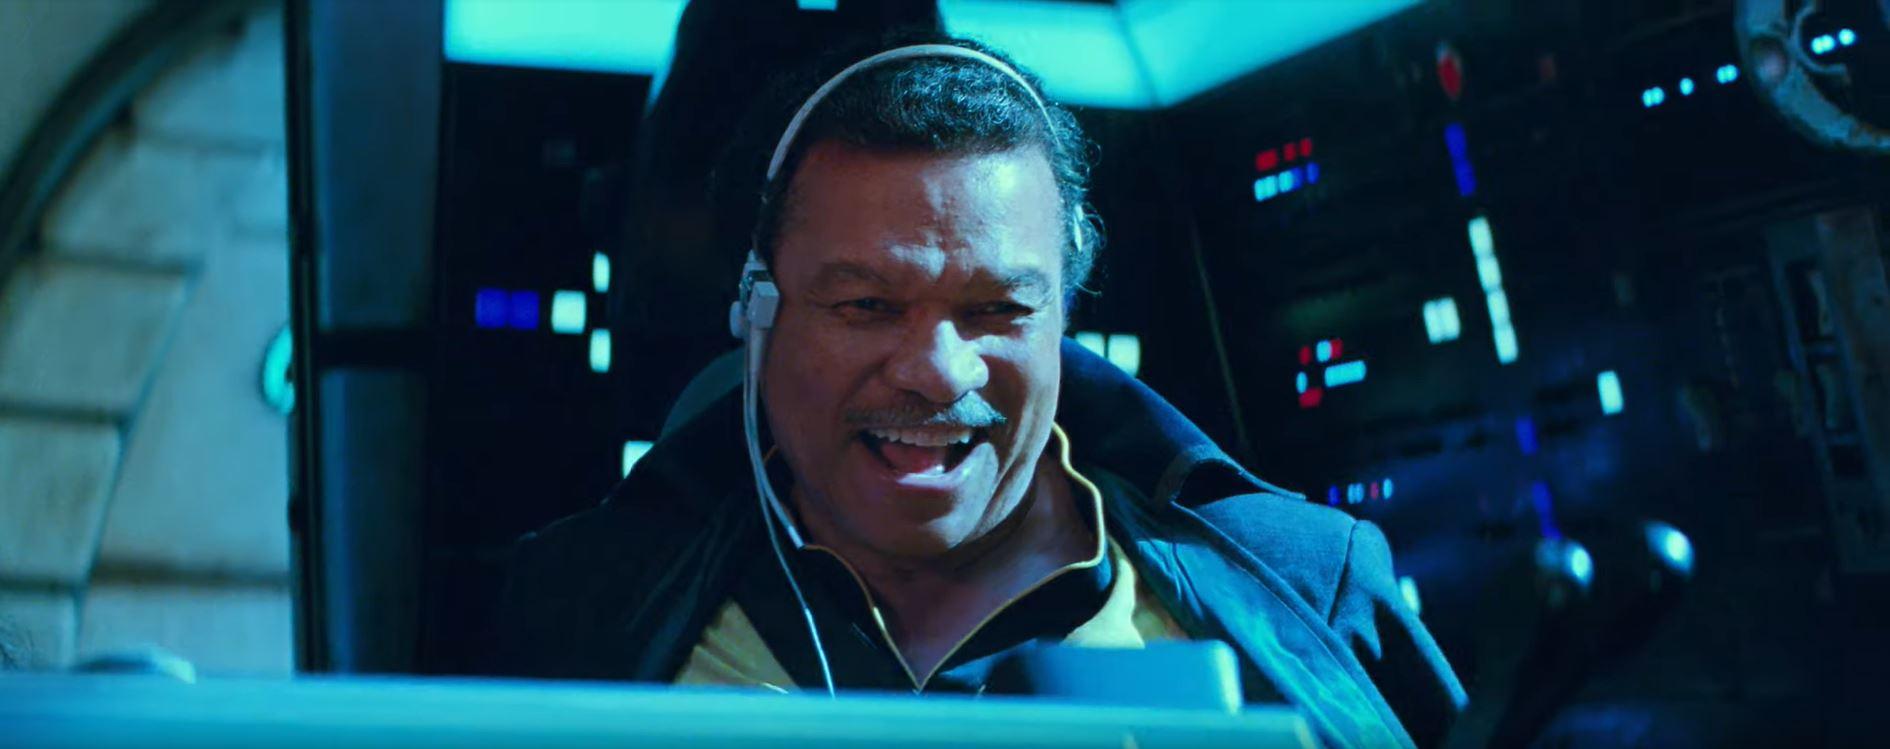 Star Wars The Rise of Skywalker Billy Dee Williams as Lando Calrissian inside the Millennium Falcon